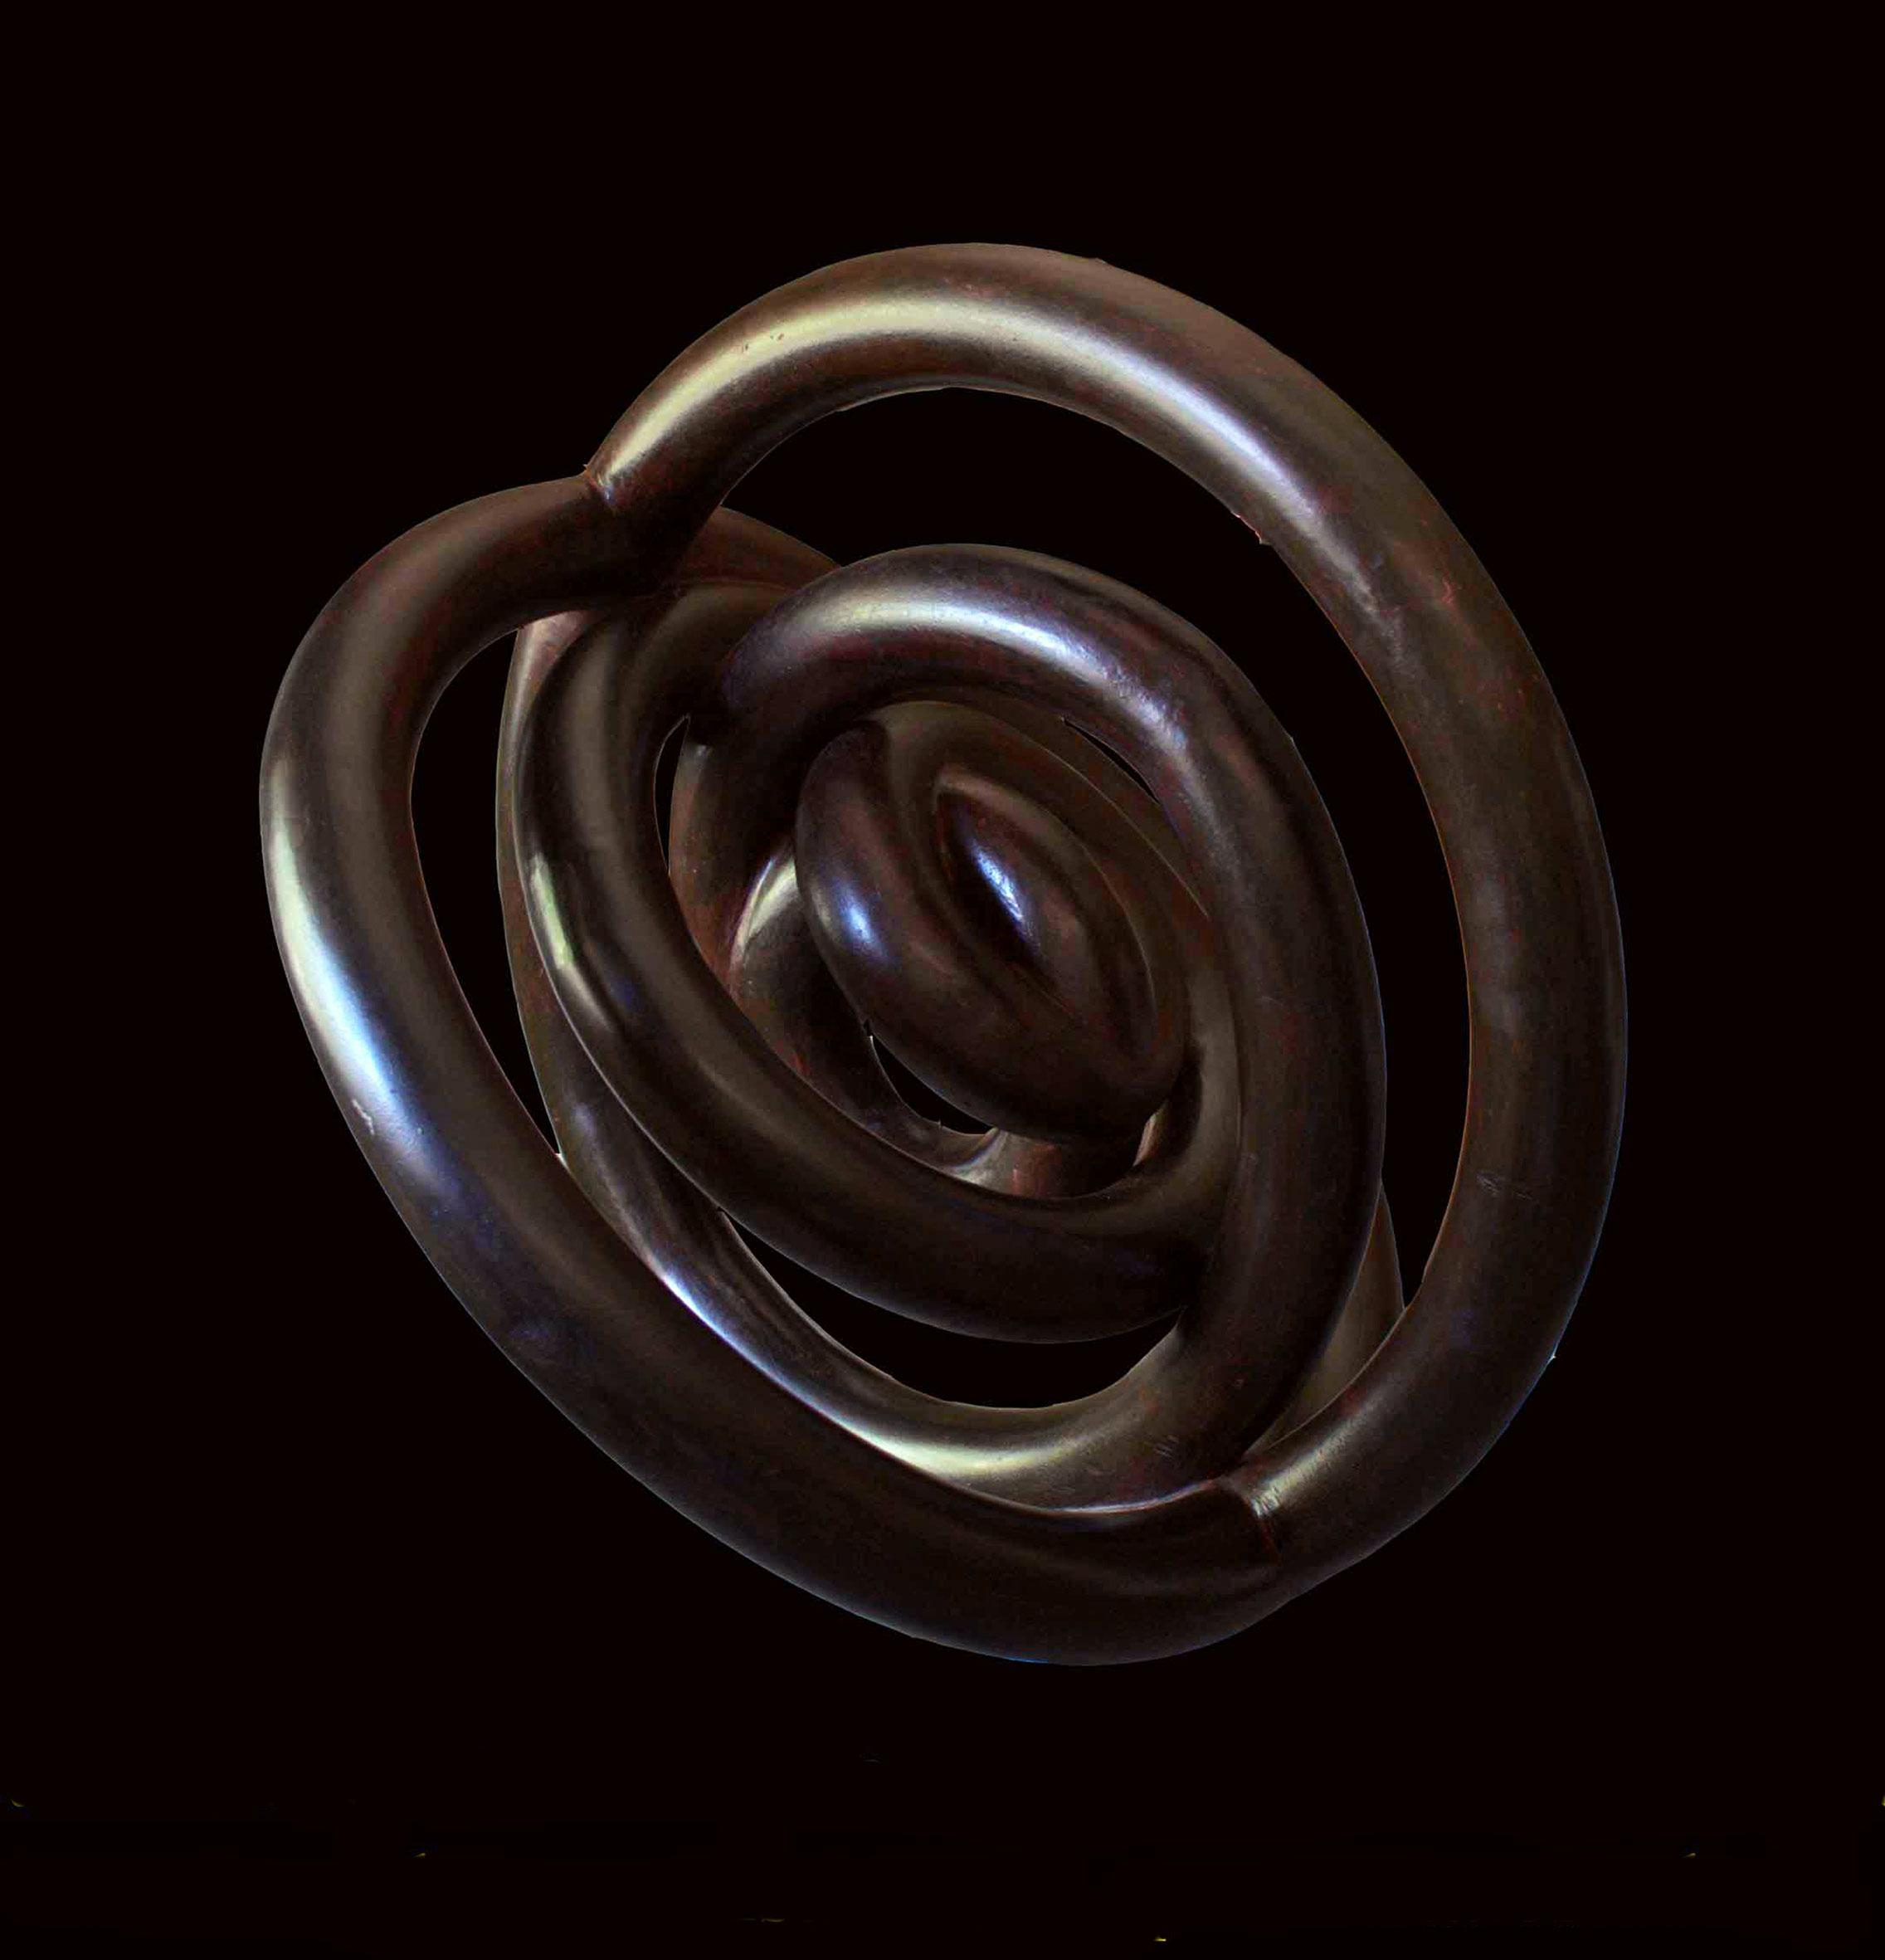 Doble espiral (1998) - Ángel Membiela